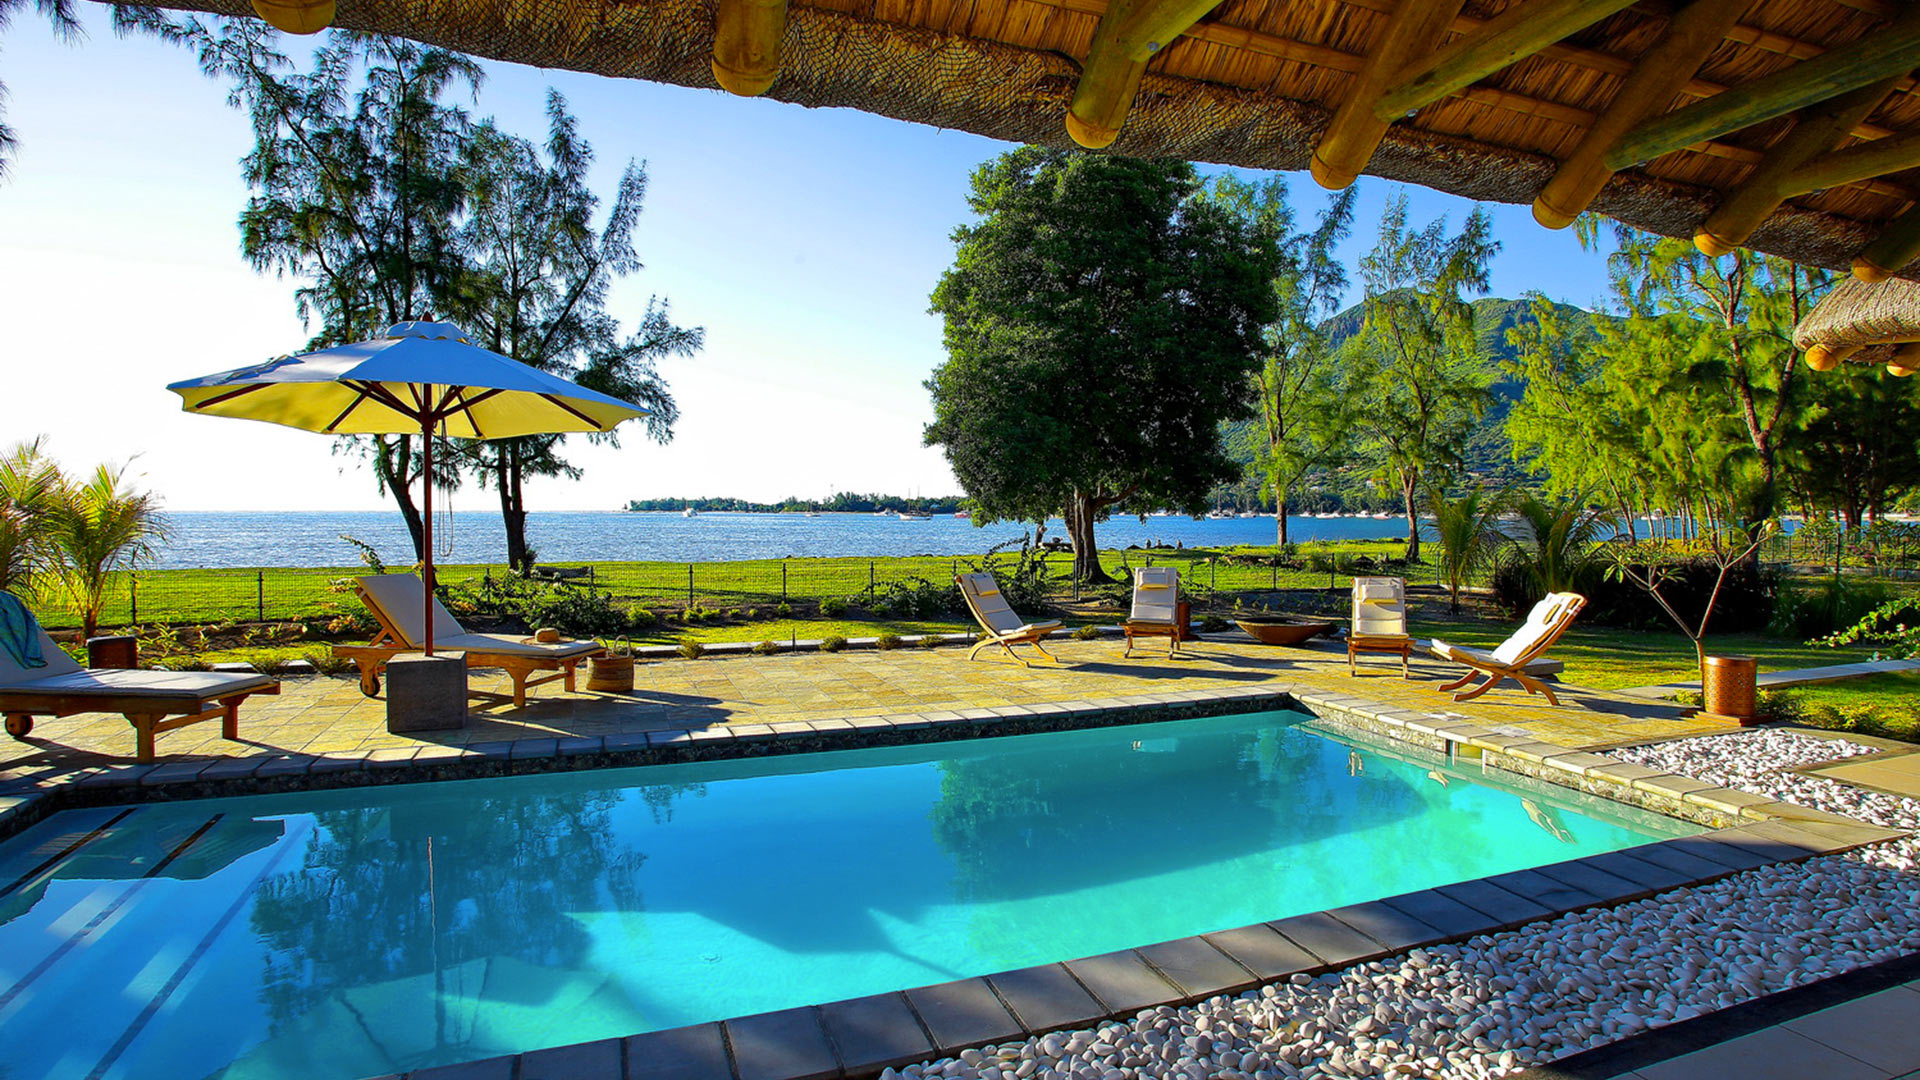 Photos of villa coco in mauritius west villanovo for Swimming pool mauritius